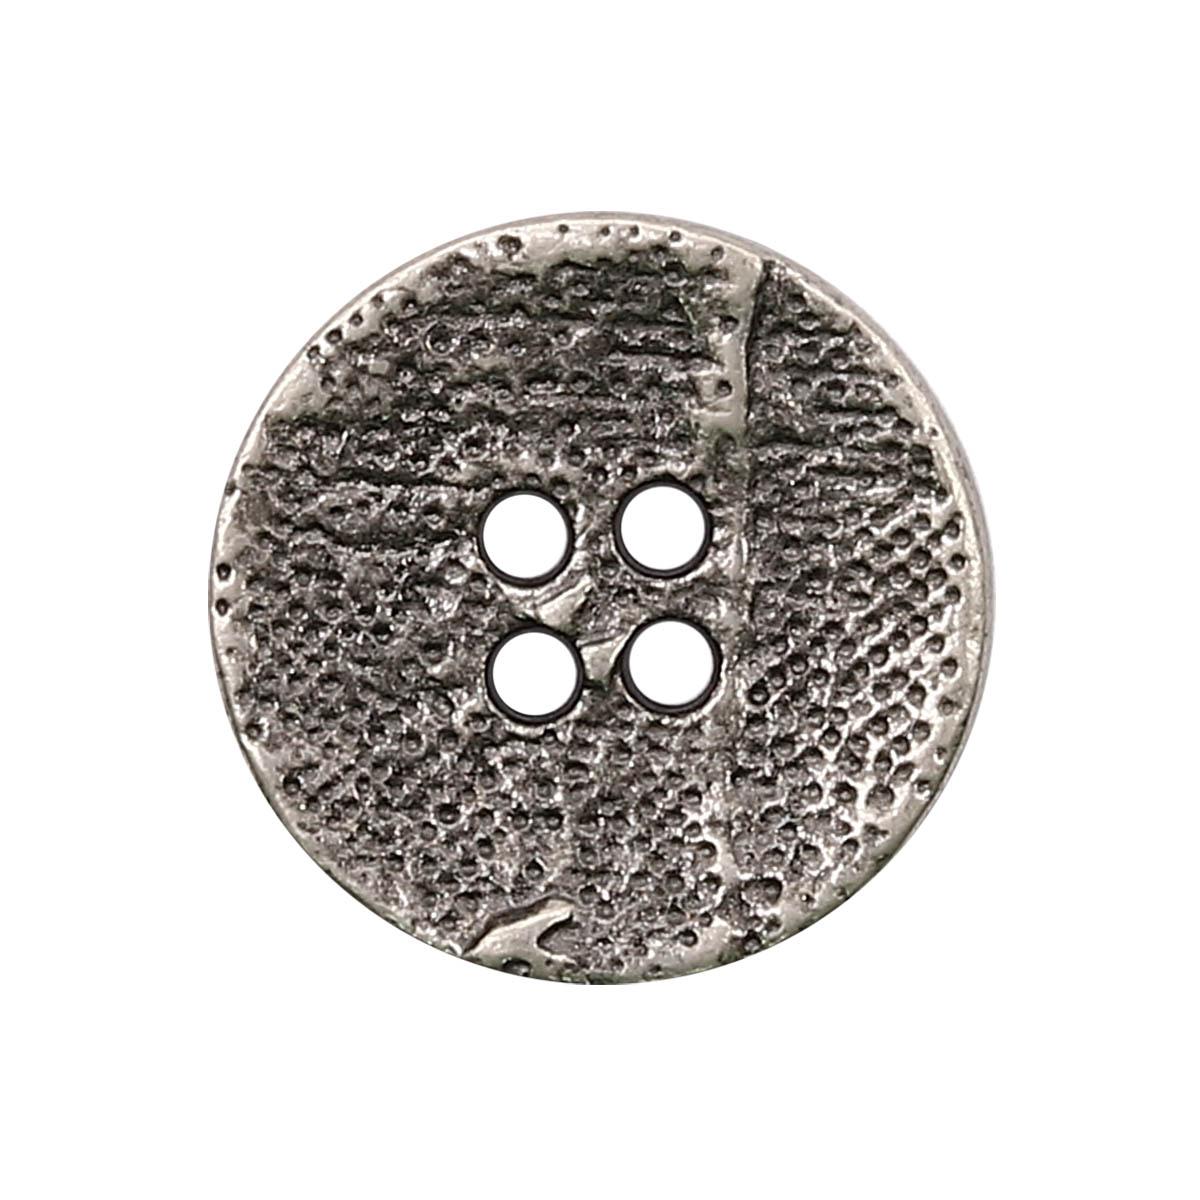 63375/4 Пуговица 4 прокола д-20мм т.сереб. мет ГР